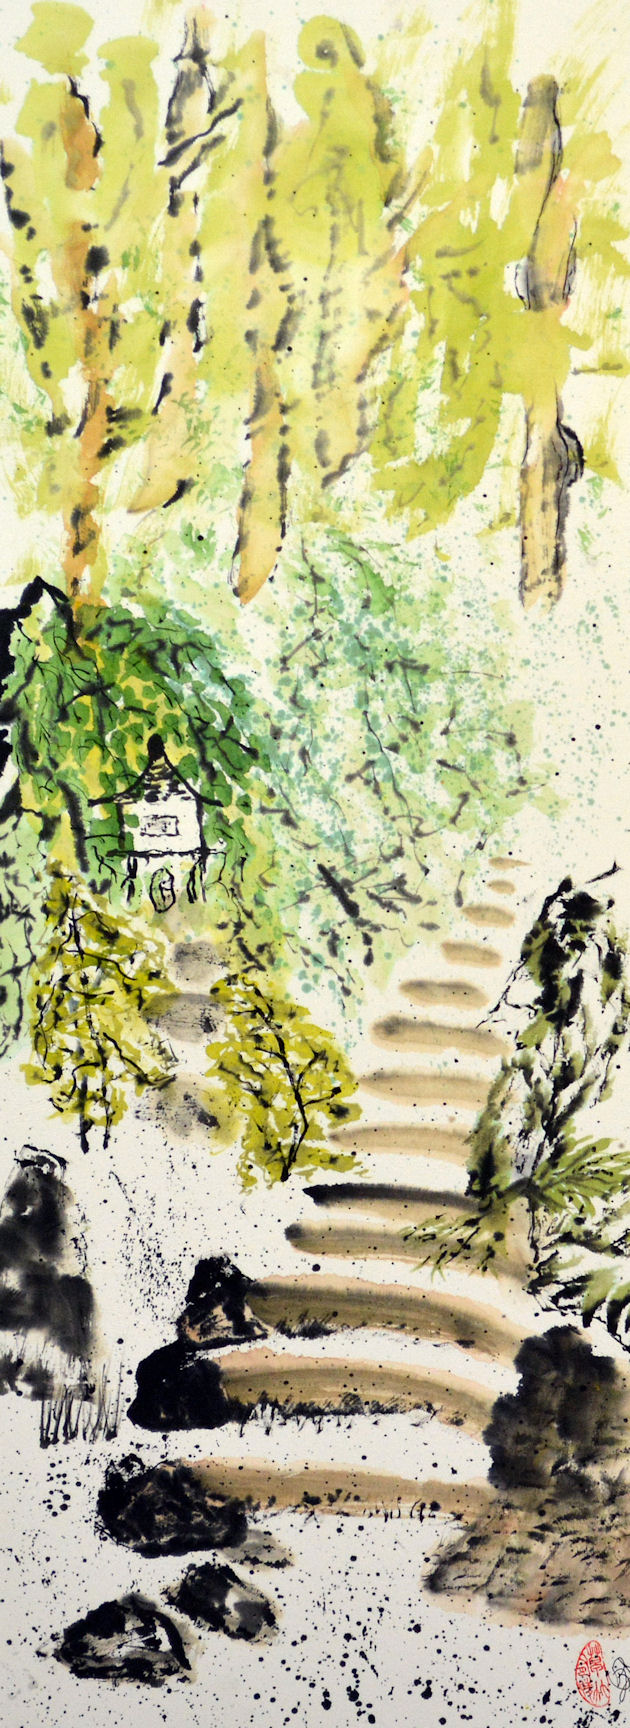 B Nolan Stairway 2.jpg